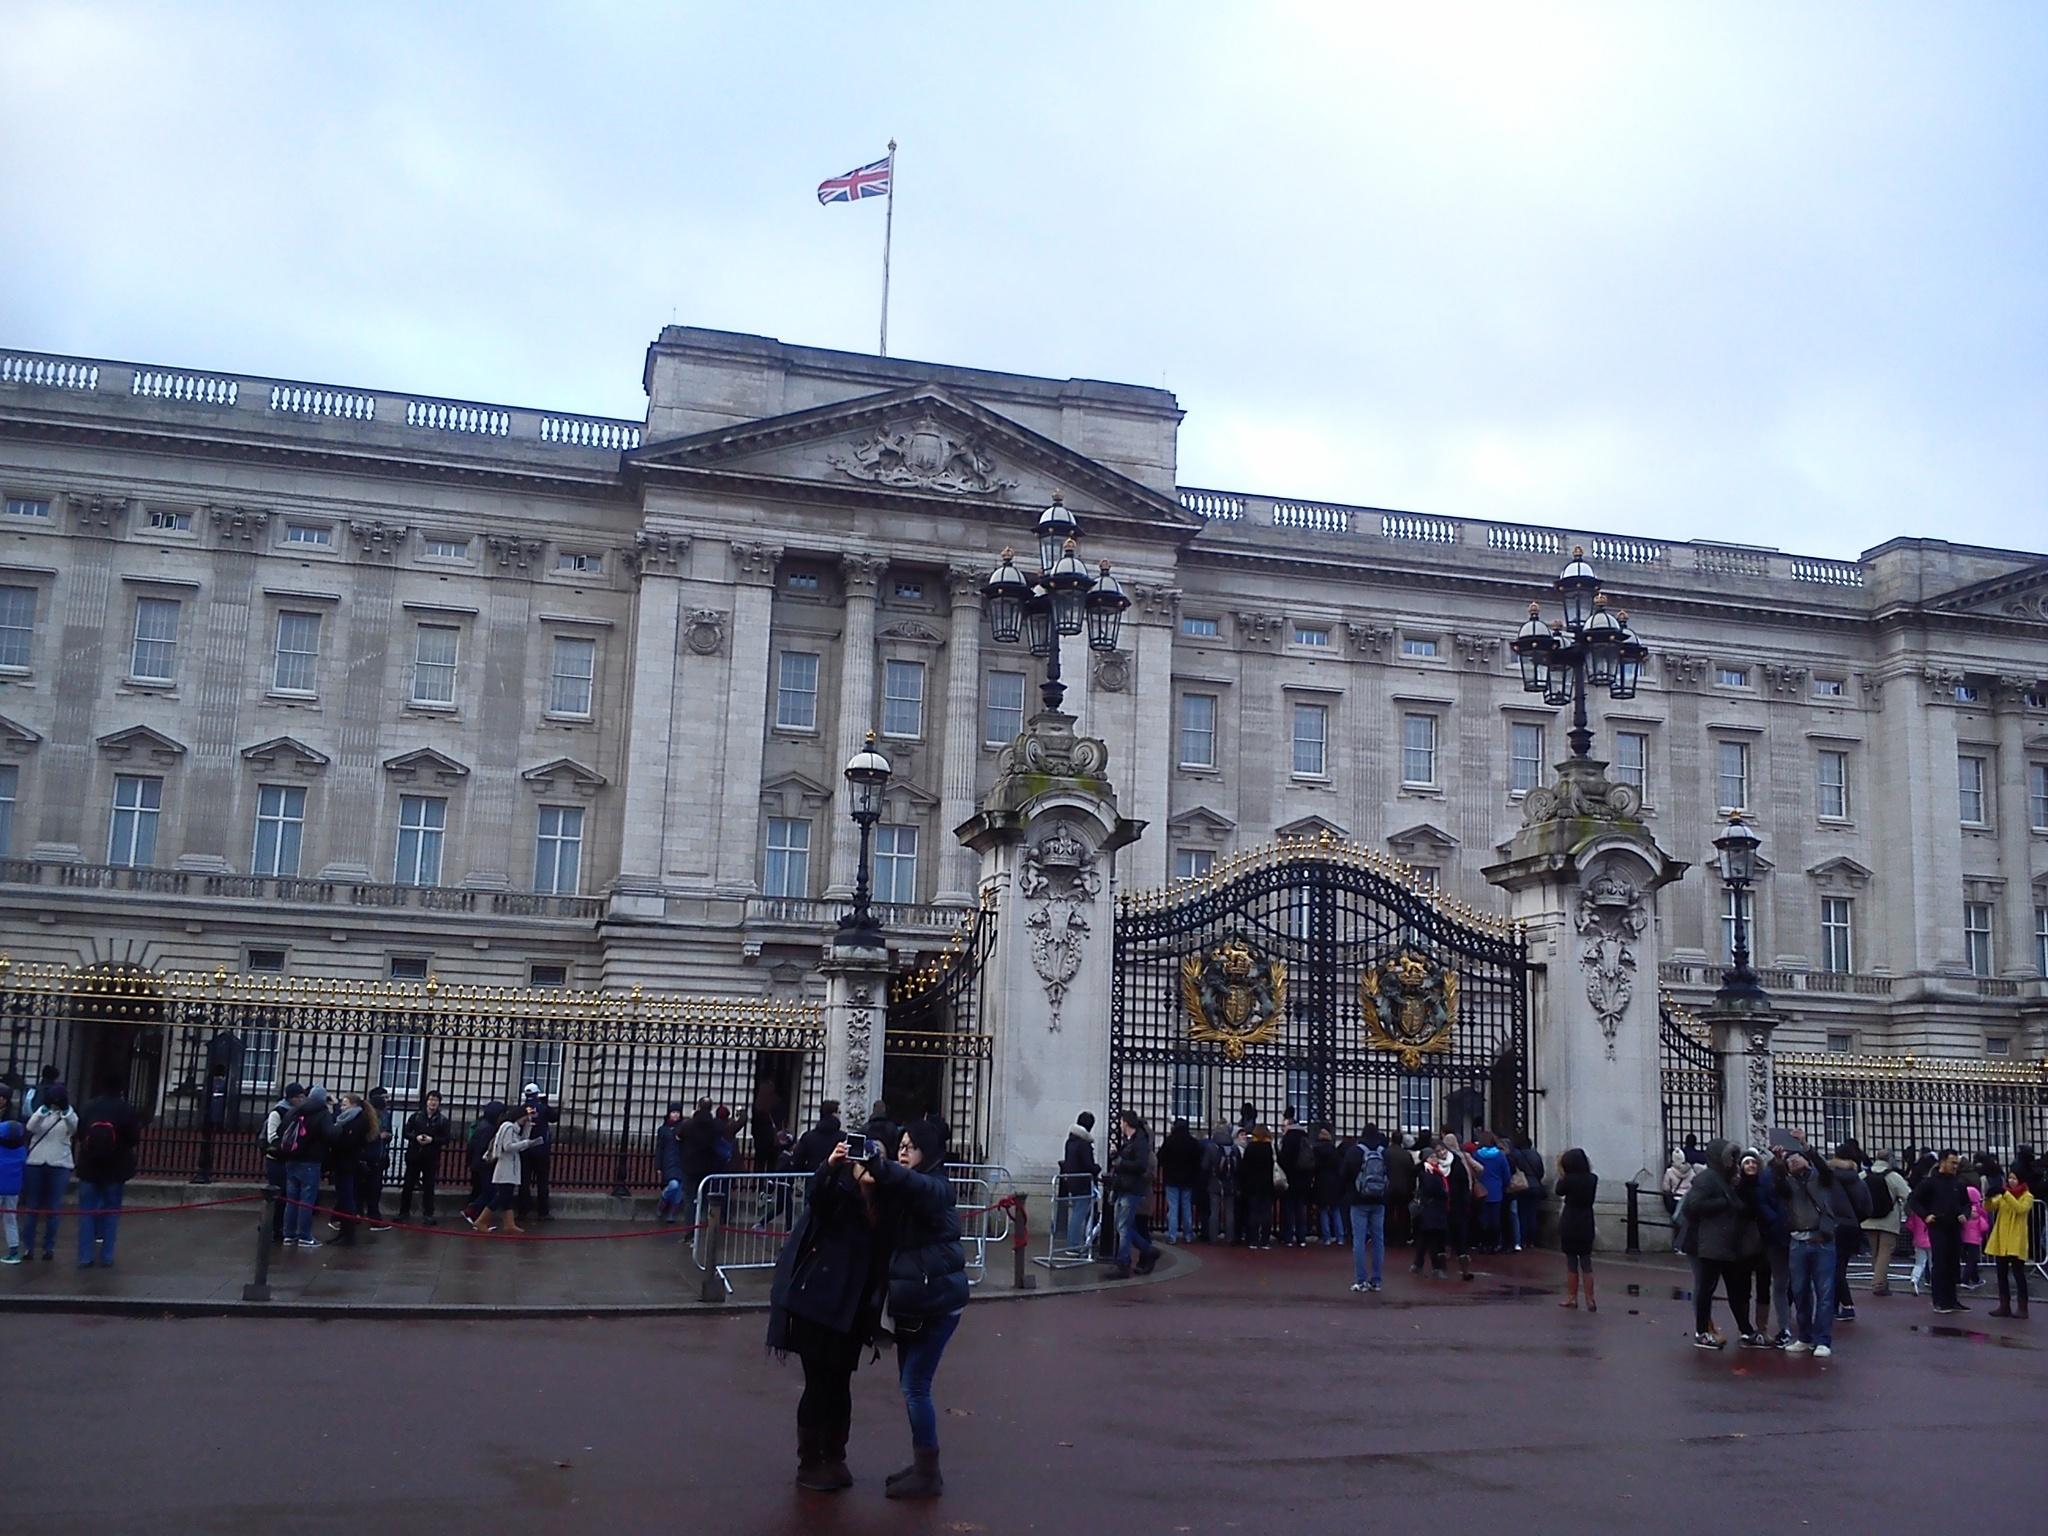 Buckingham Palace, London by Gunnerman85